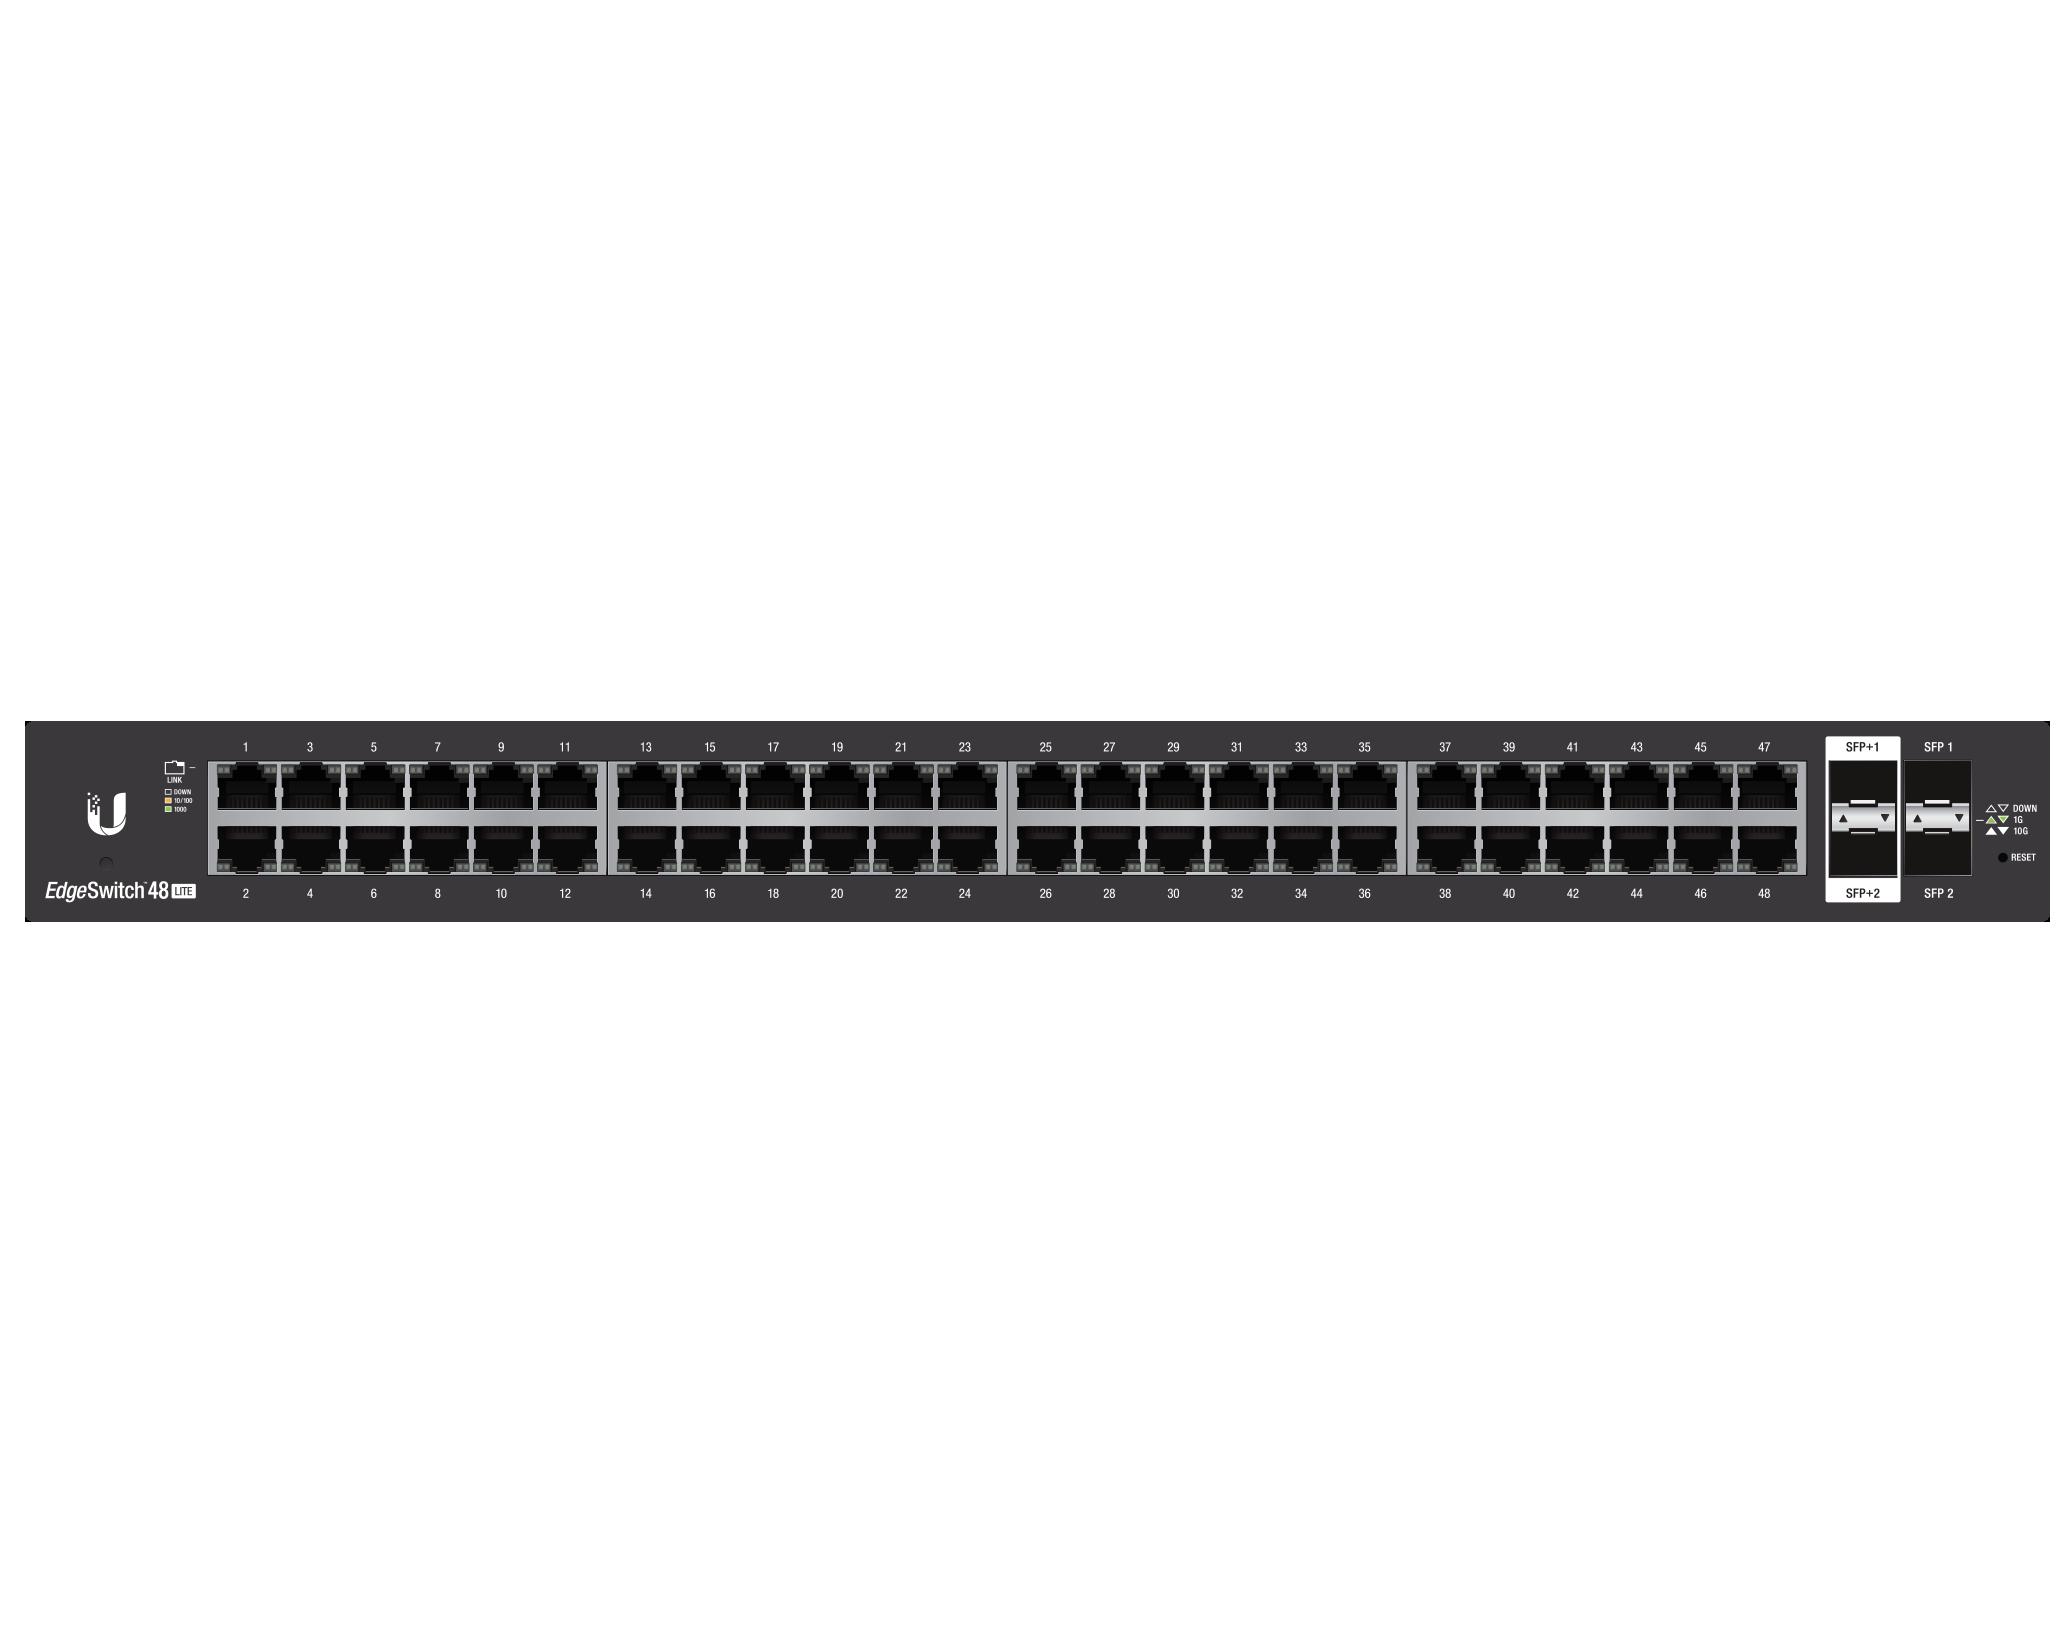 Switch Ubiquiti ES-48-LITE cu management fara PoE 48x1000Mbps + 2xSFP + 2xSFP+